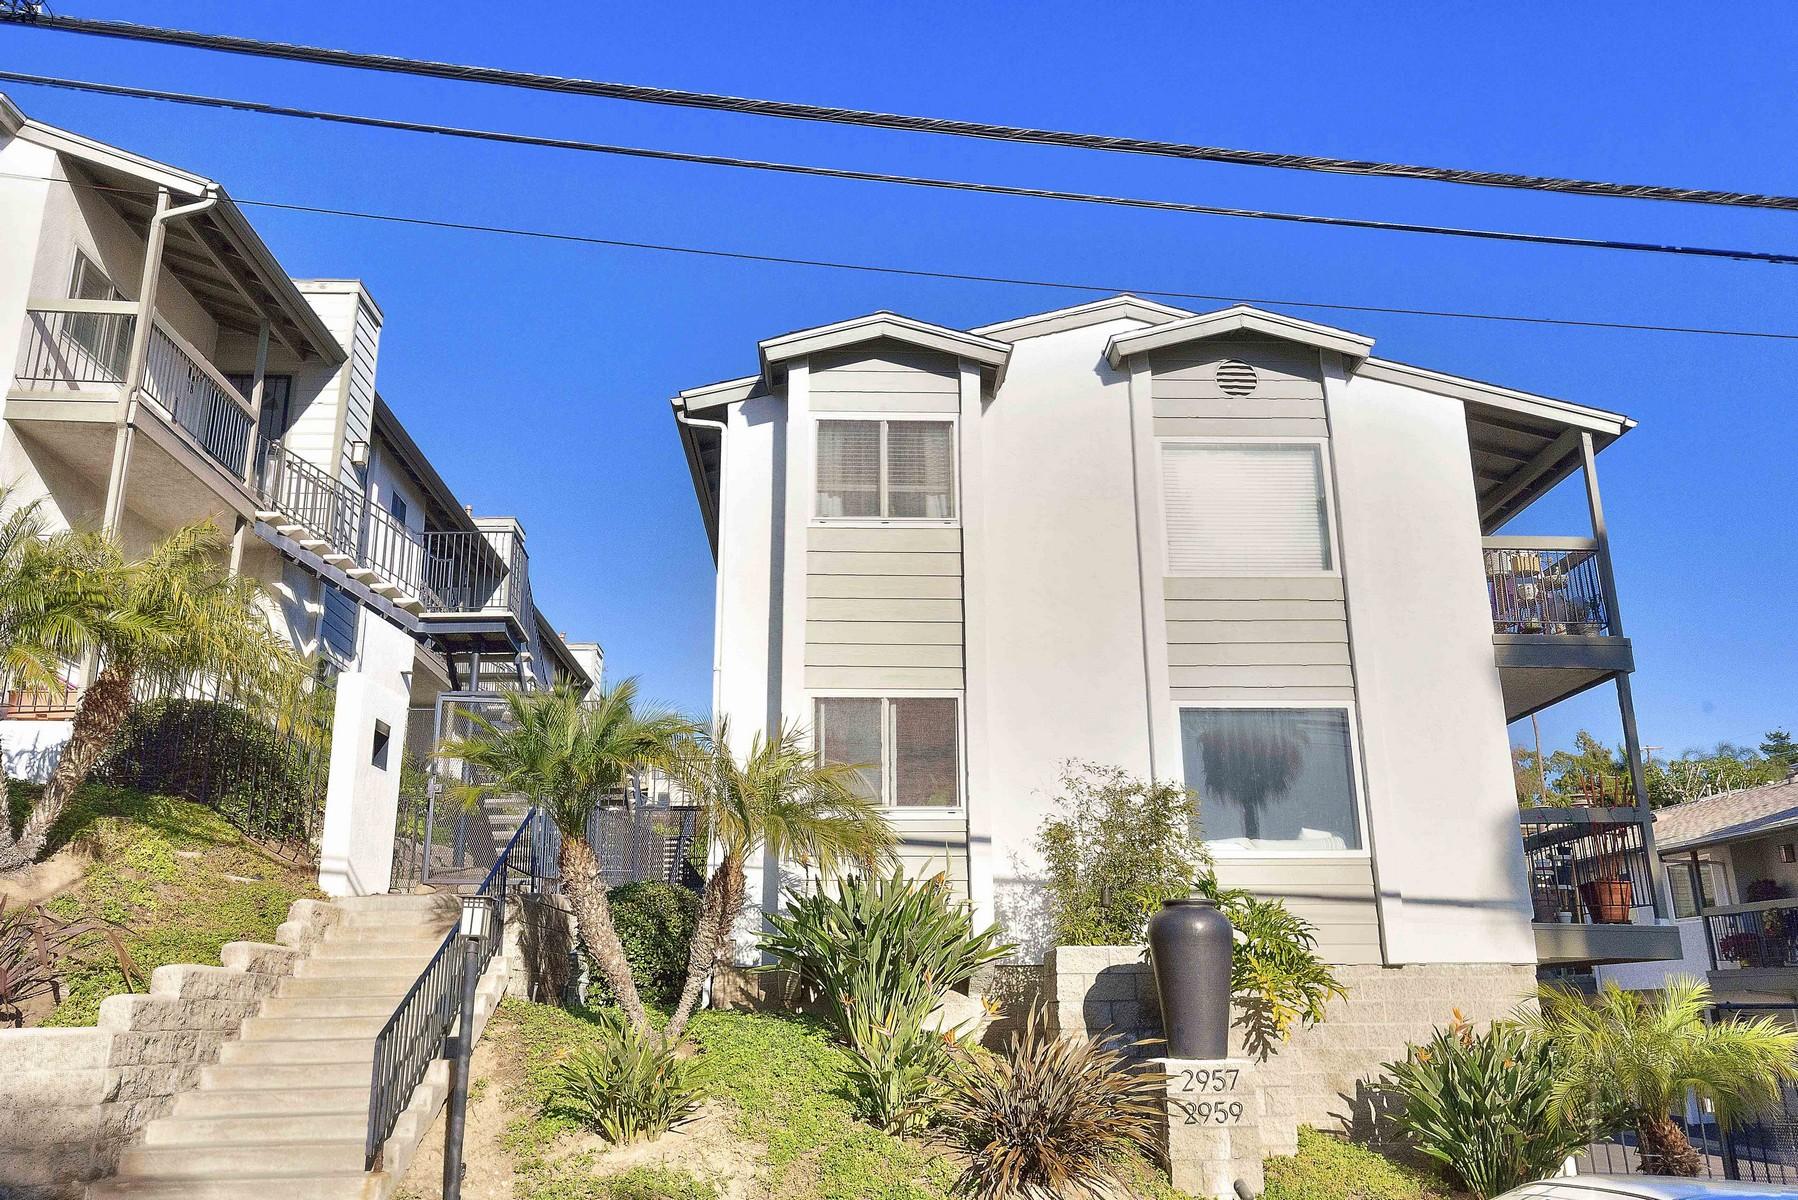 Condomínio para Venda às 2957 Columbia Street #10 San Diego, Califórnia, 92103 Estados Unidos